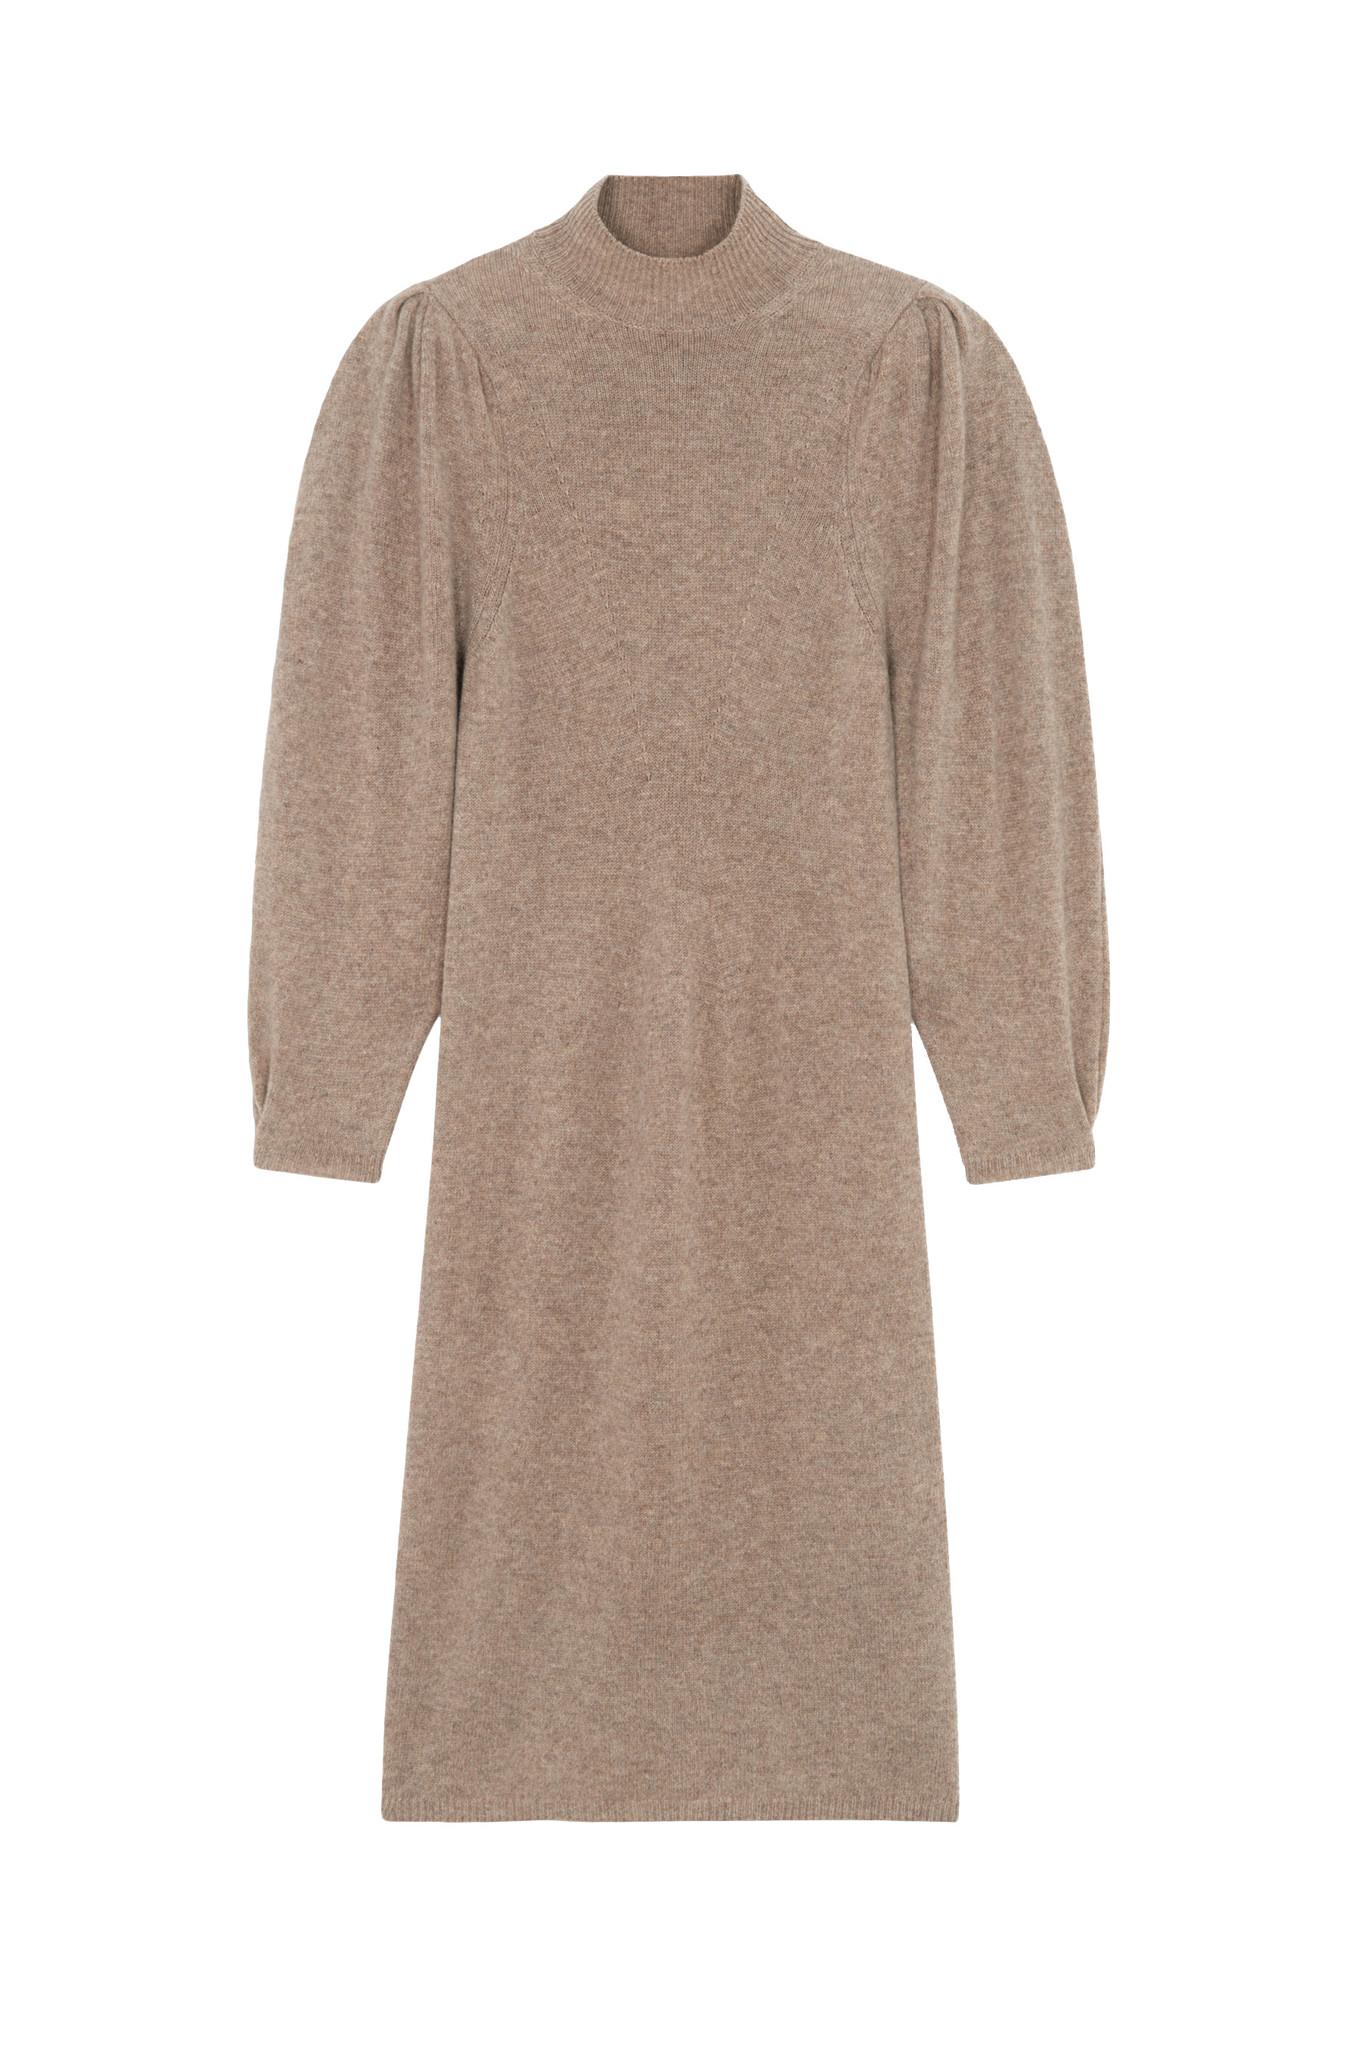 Felicity Dress - Beige-1